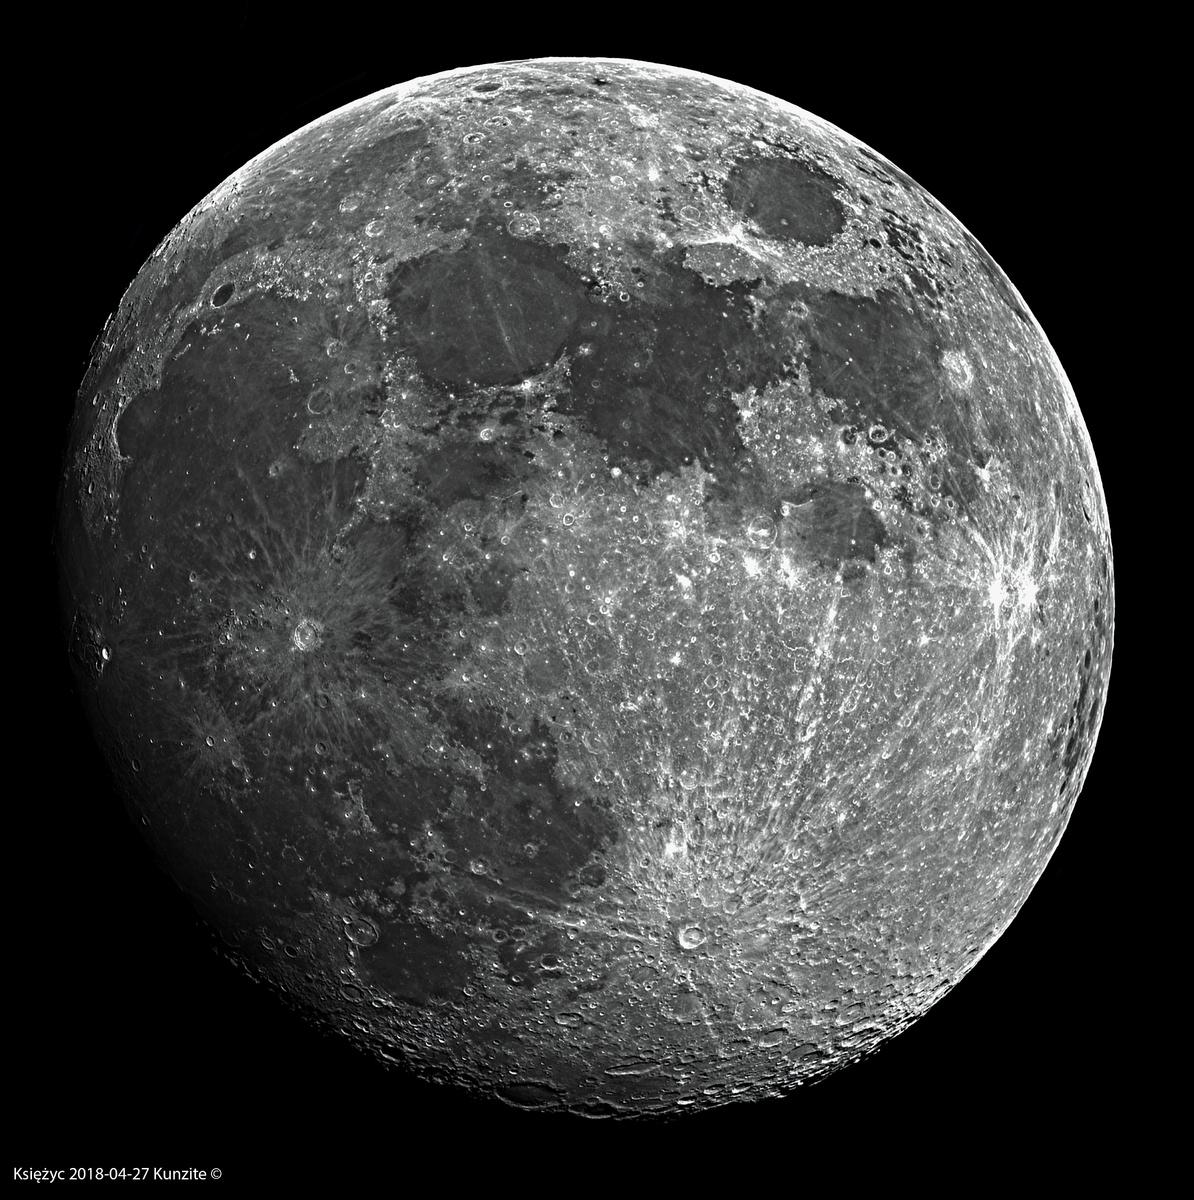 20180427_moon_21_07_38_reg.thumb.jpg.6b1cb4cafef79821c99d879eab2f7512.jpg